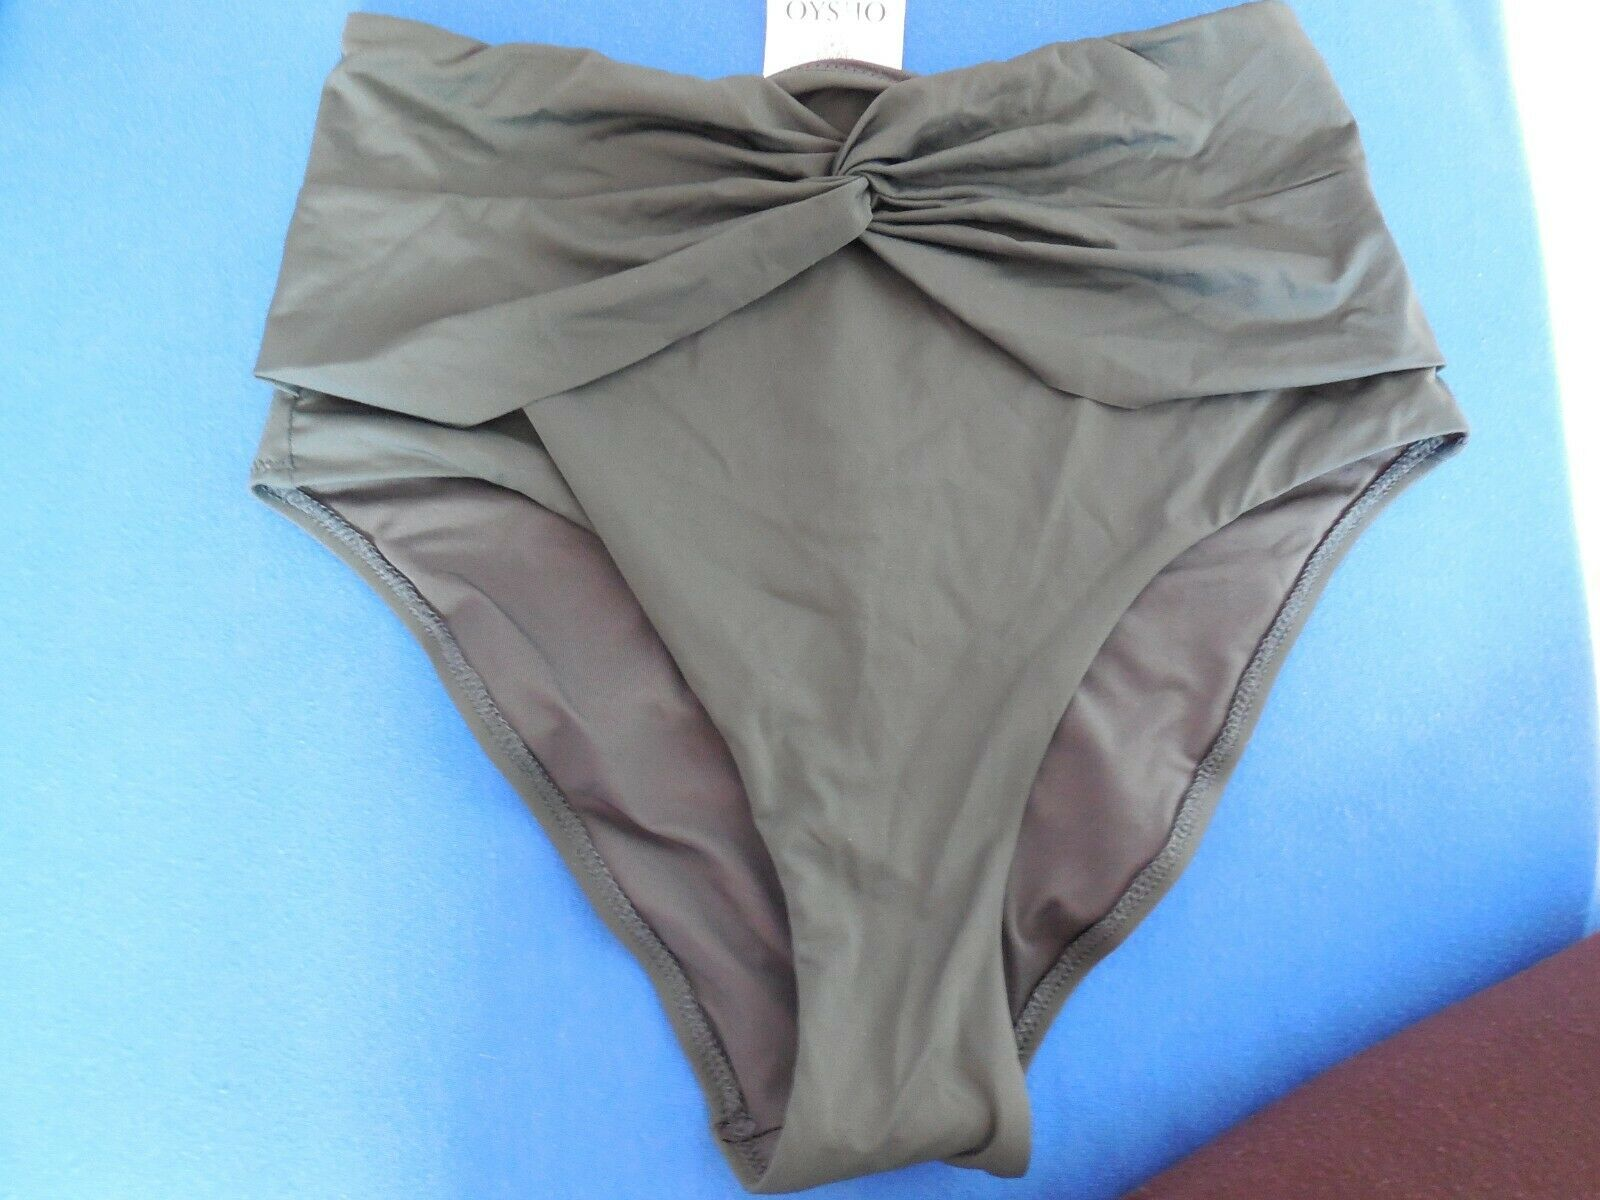 oysho hoch geschnittener bikinislip badehose ultramar-grÜn